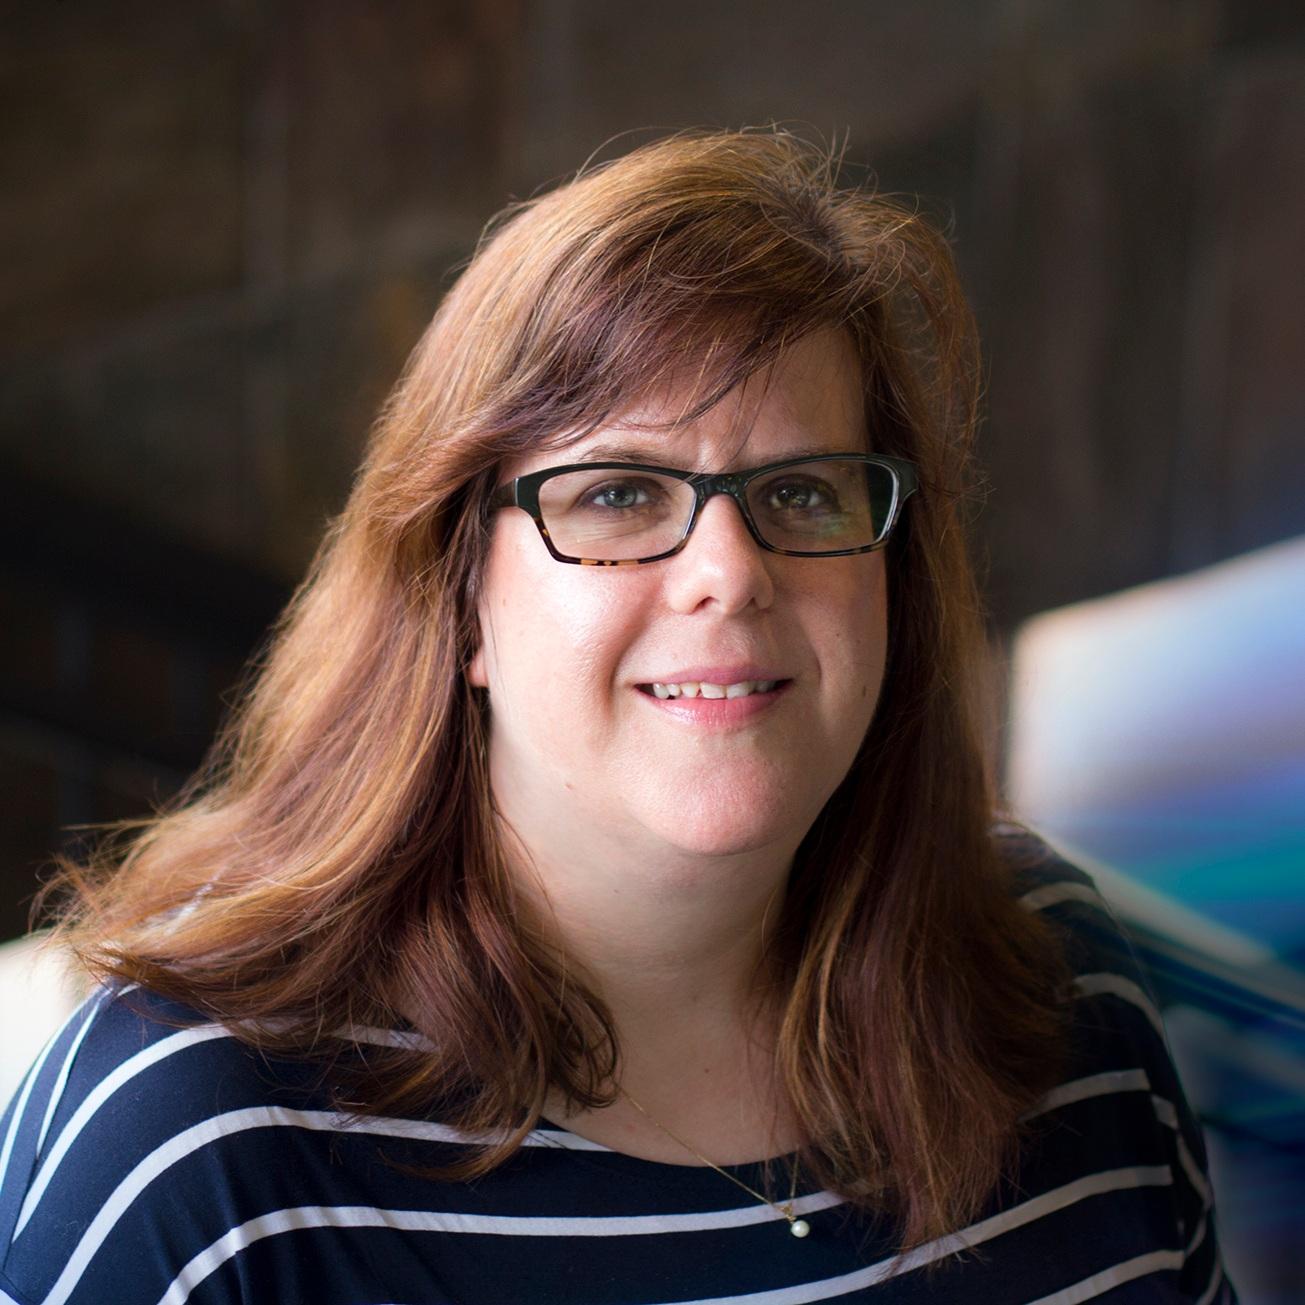 CHRISTINE THOMPSON - Senior Narrative Lead at Bungie Studios